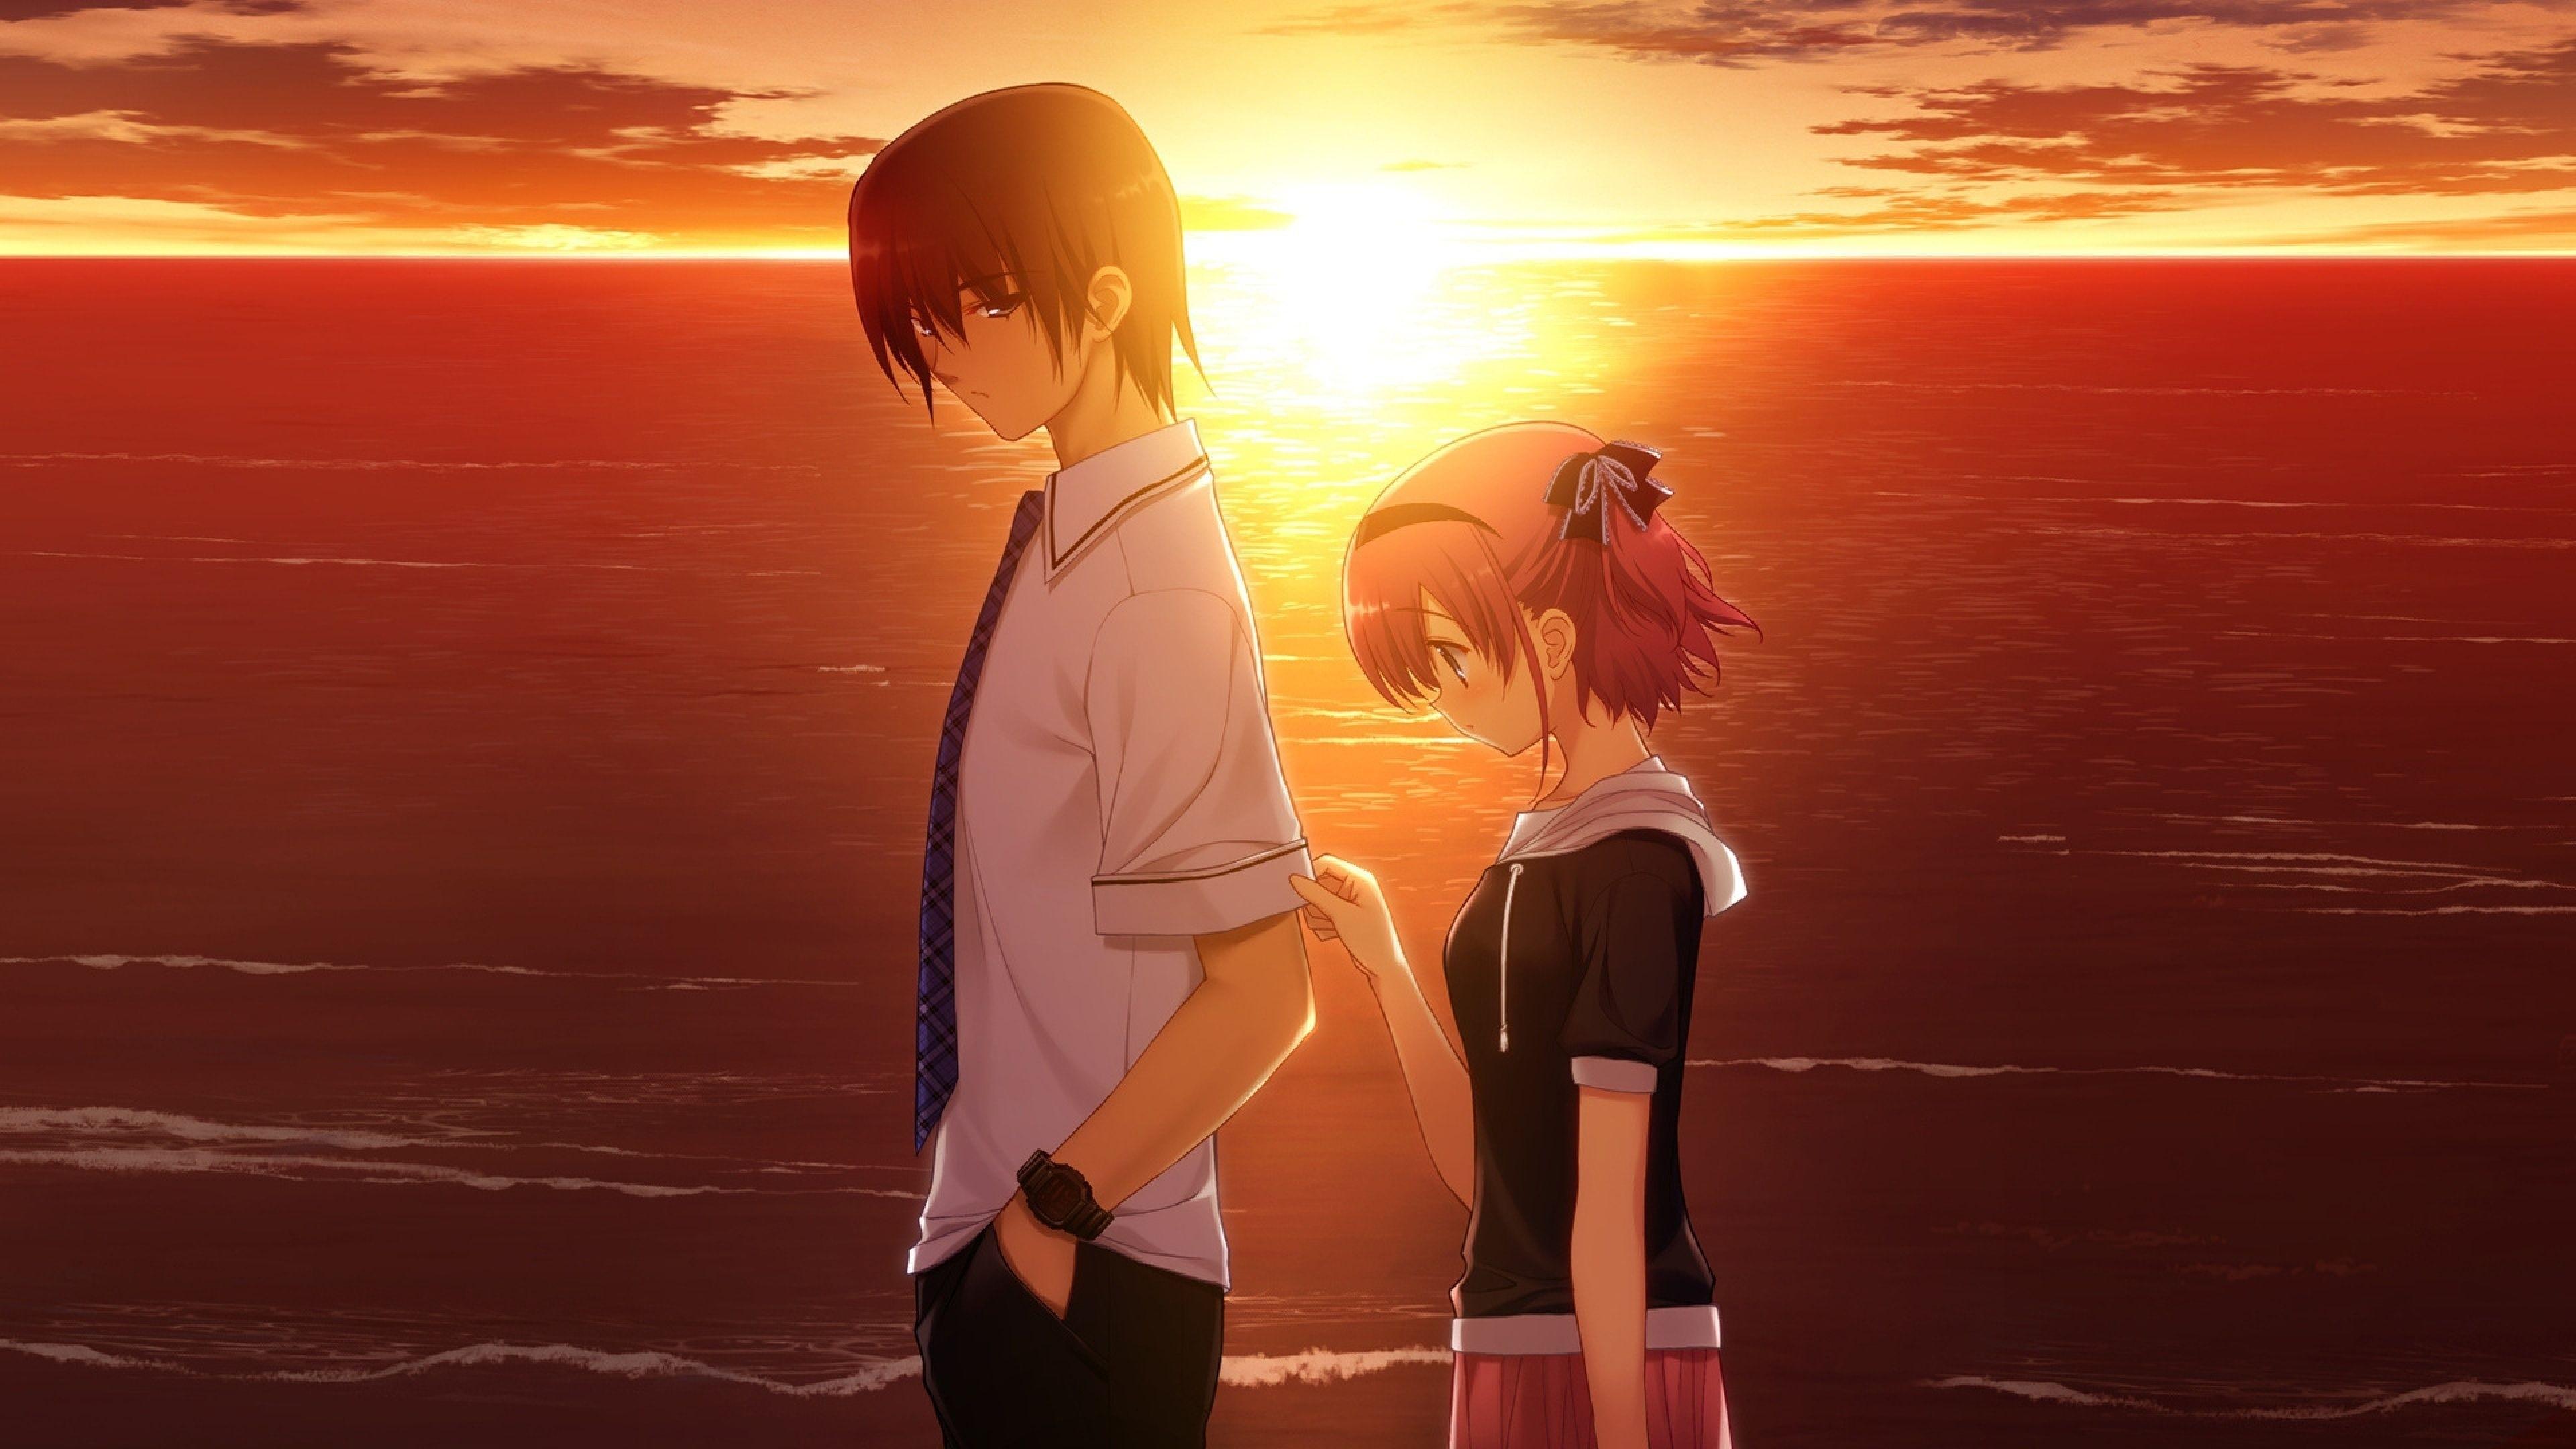 Love Anime Wallpaper 74 Images